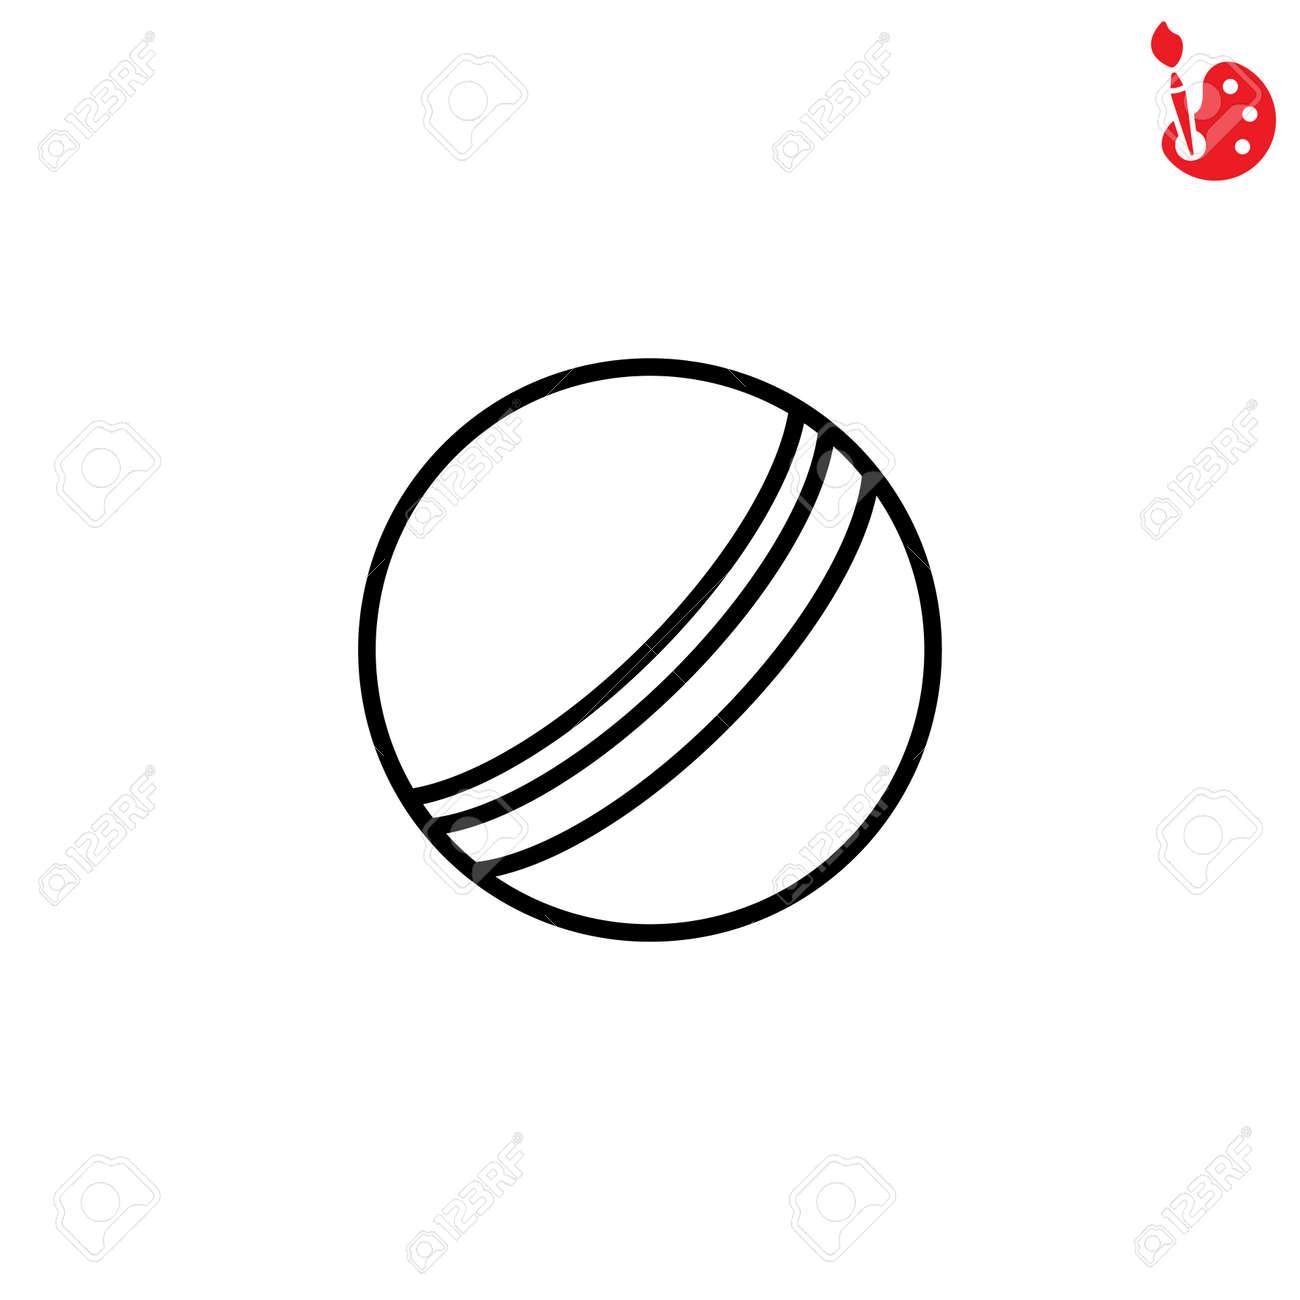 Web line icon. Ball, children's ball - 73945132